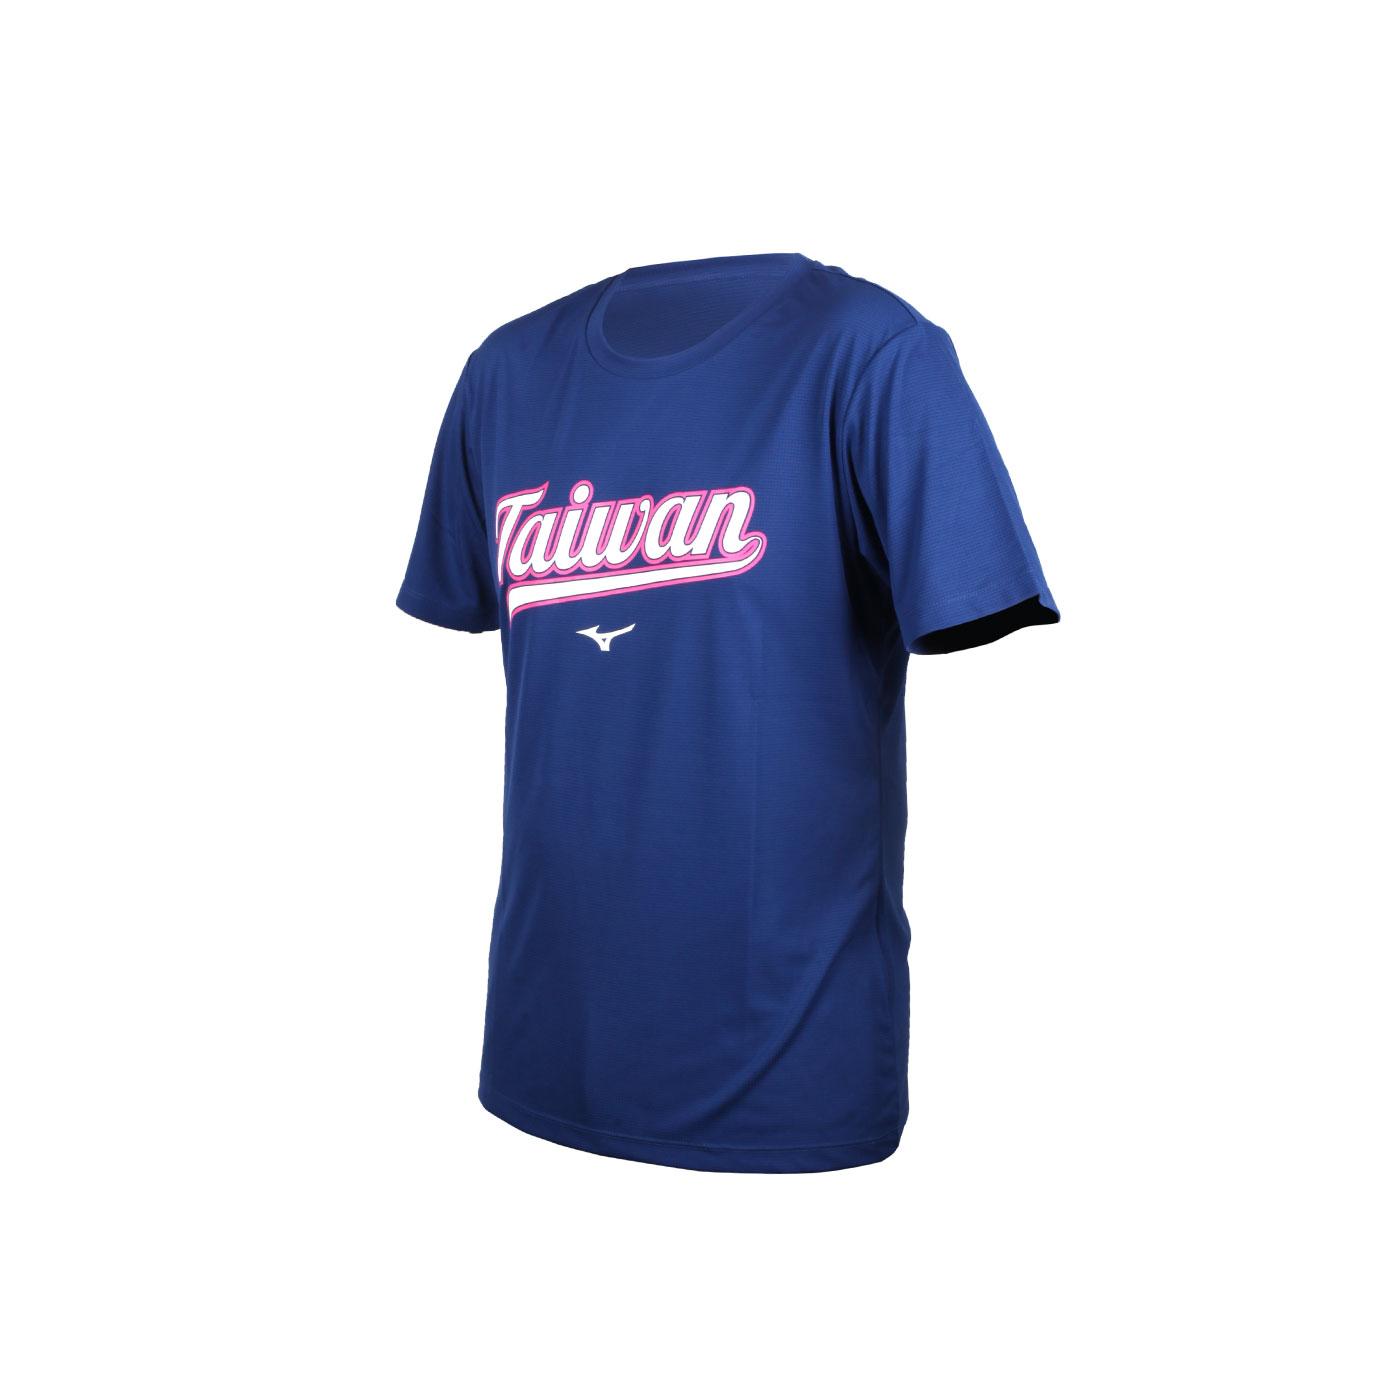 MIZUNO 男款短袖T恤 32TA051001 - 藍白粉紅